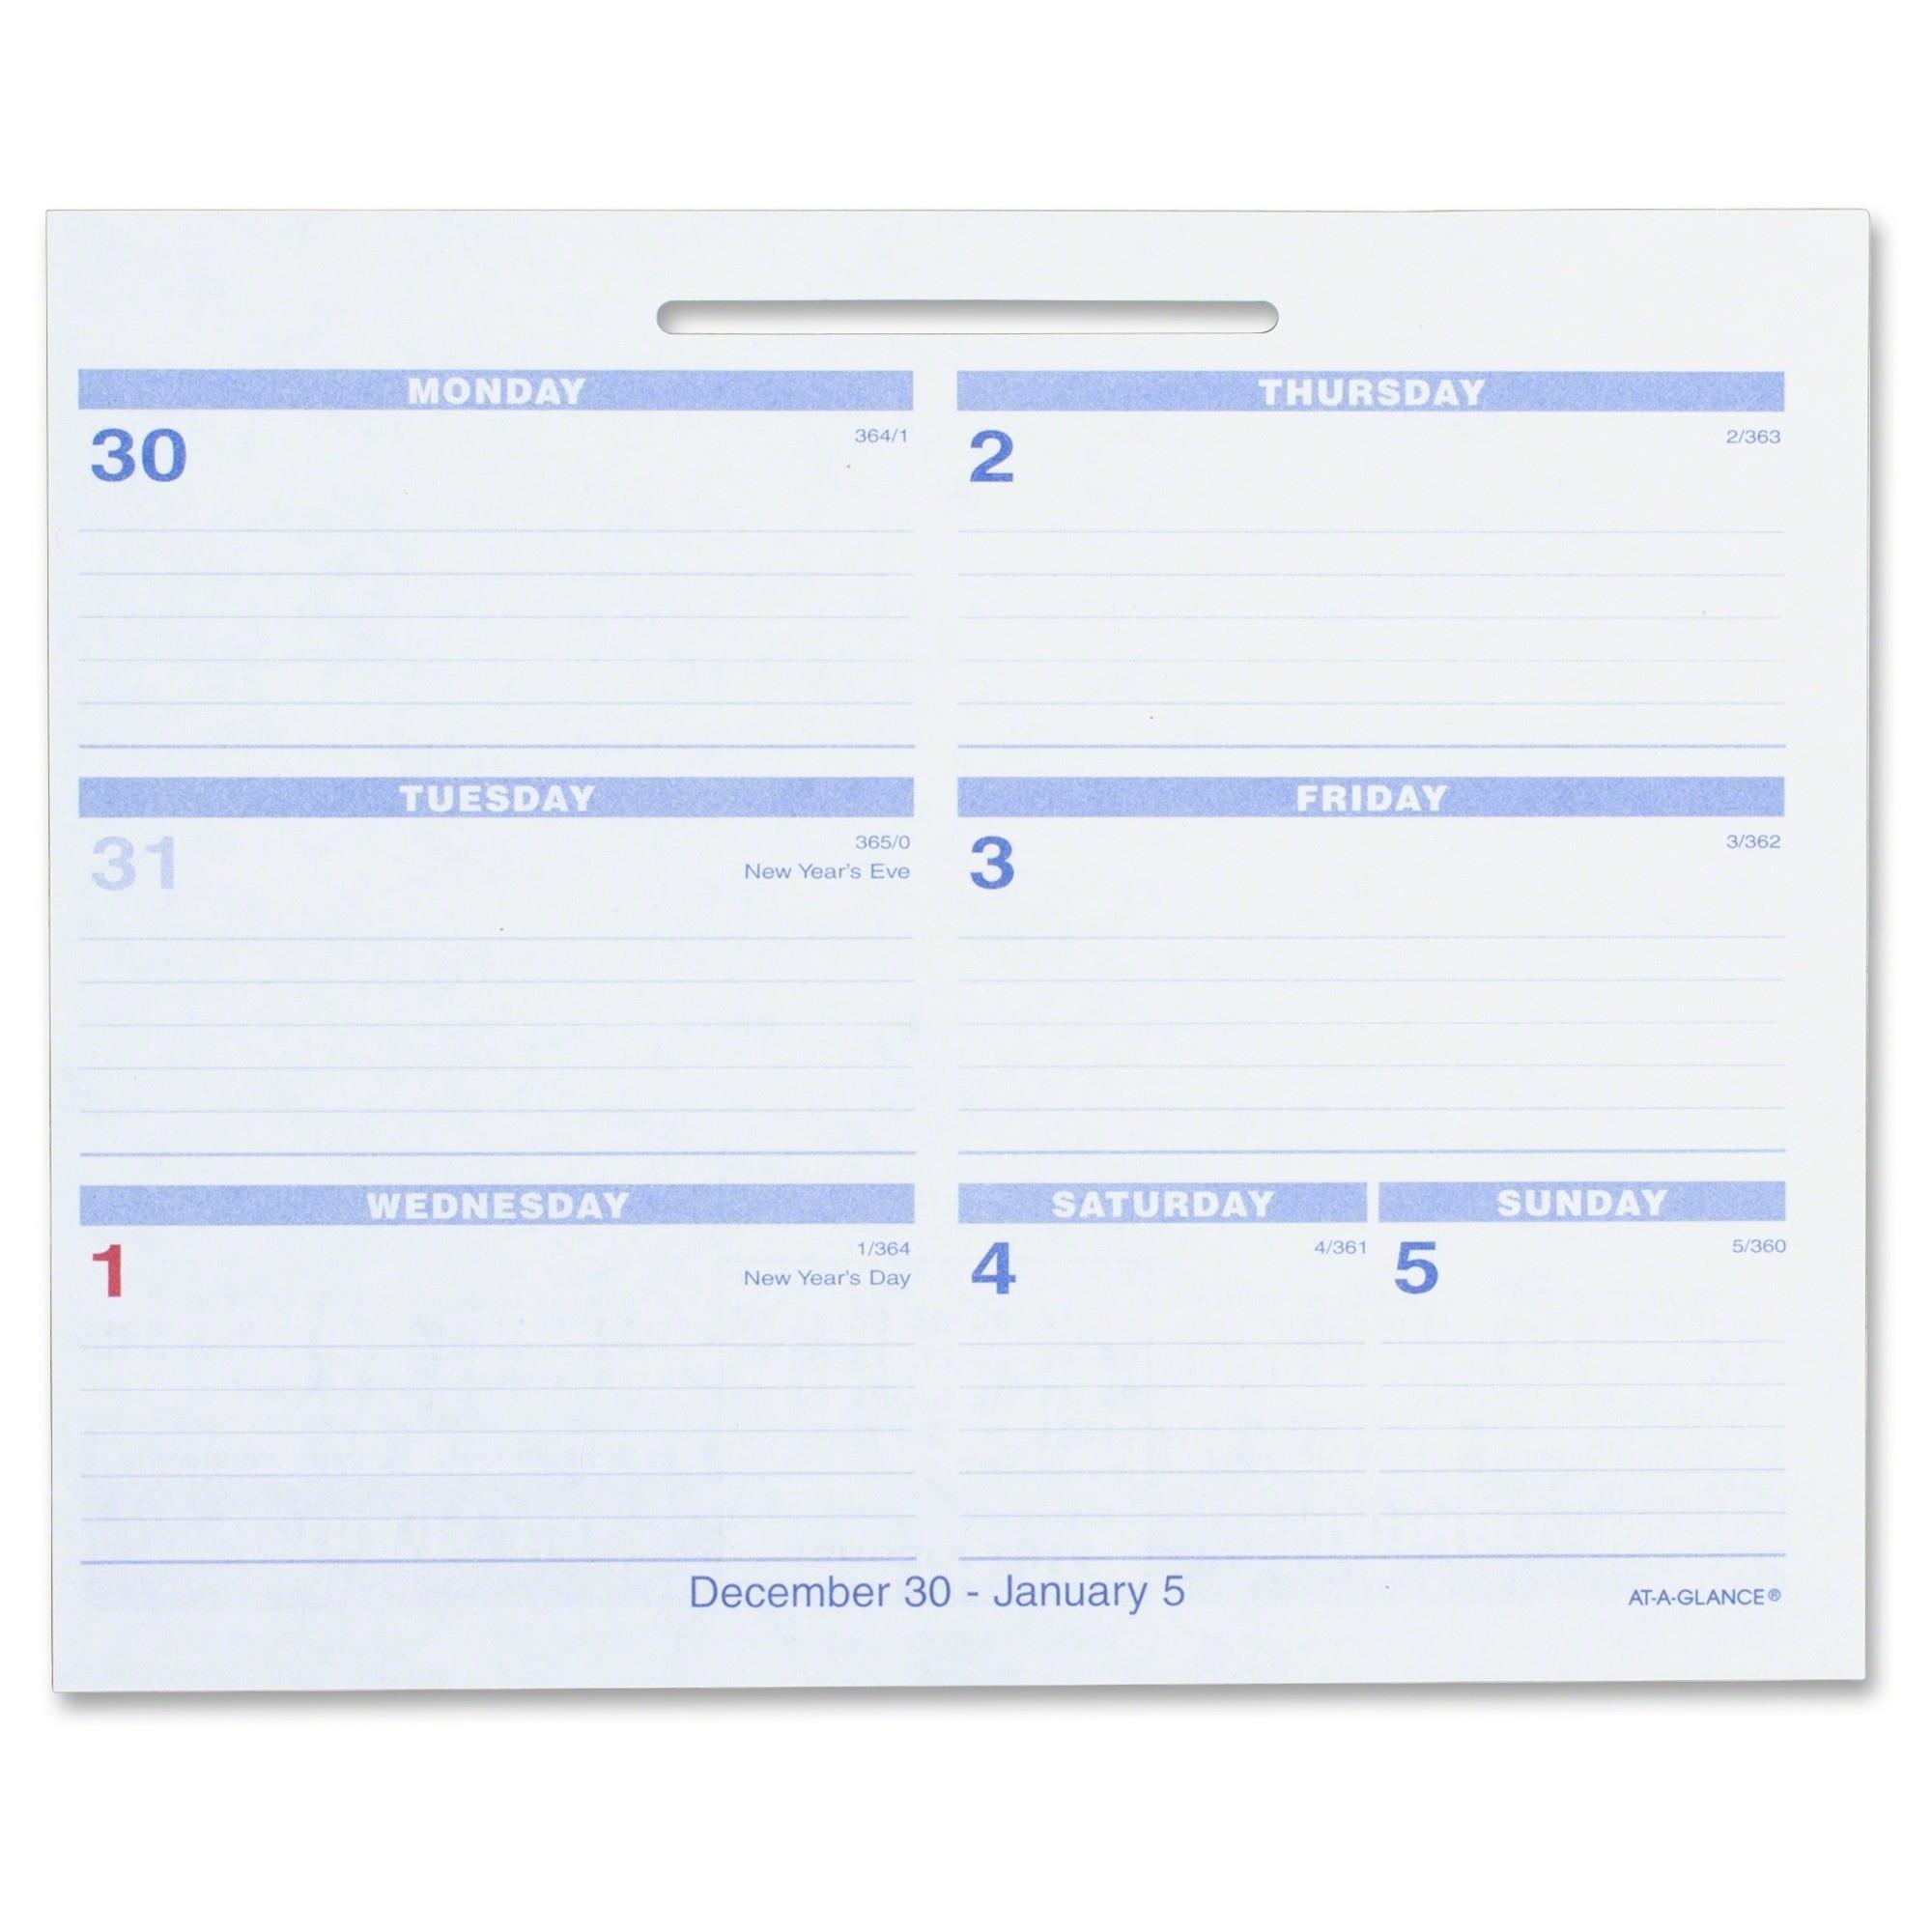 At-A-Glance Flip-A-Week Desk Calendar Refill - Ld Products